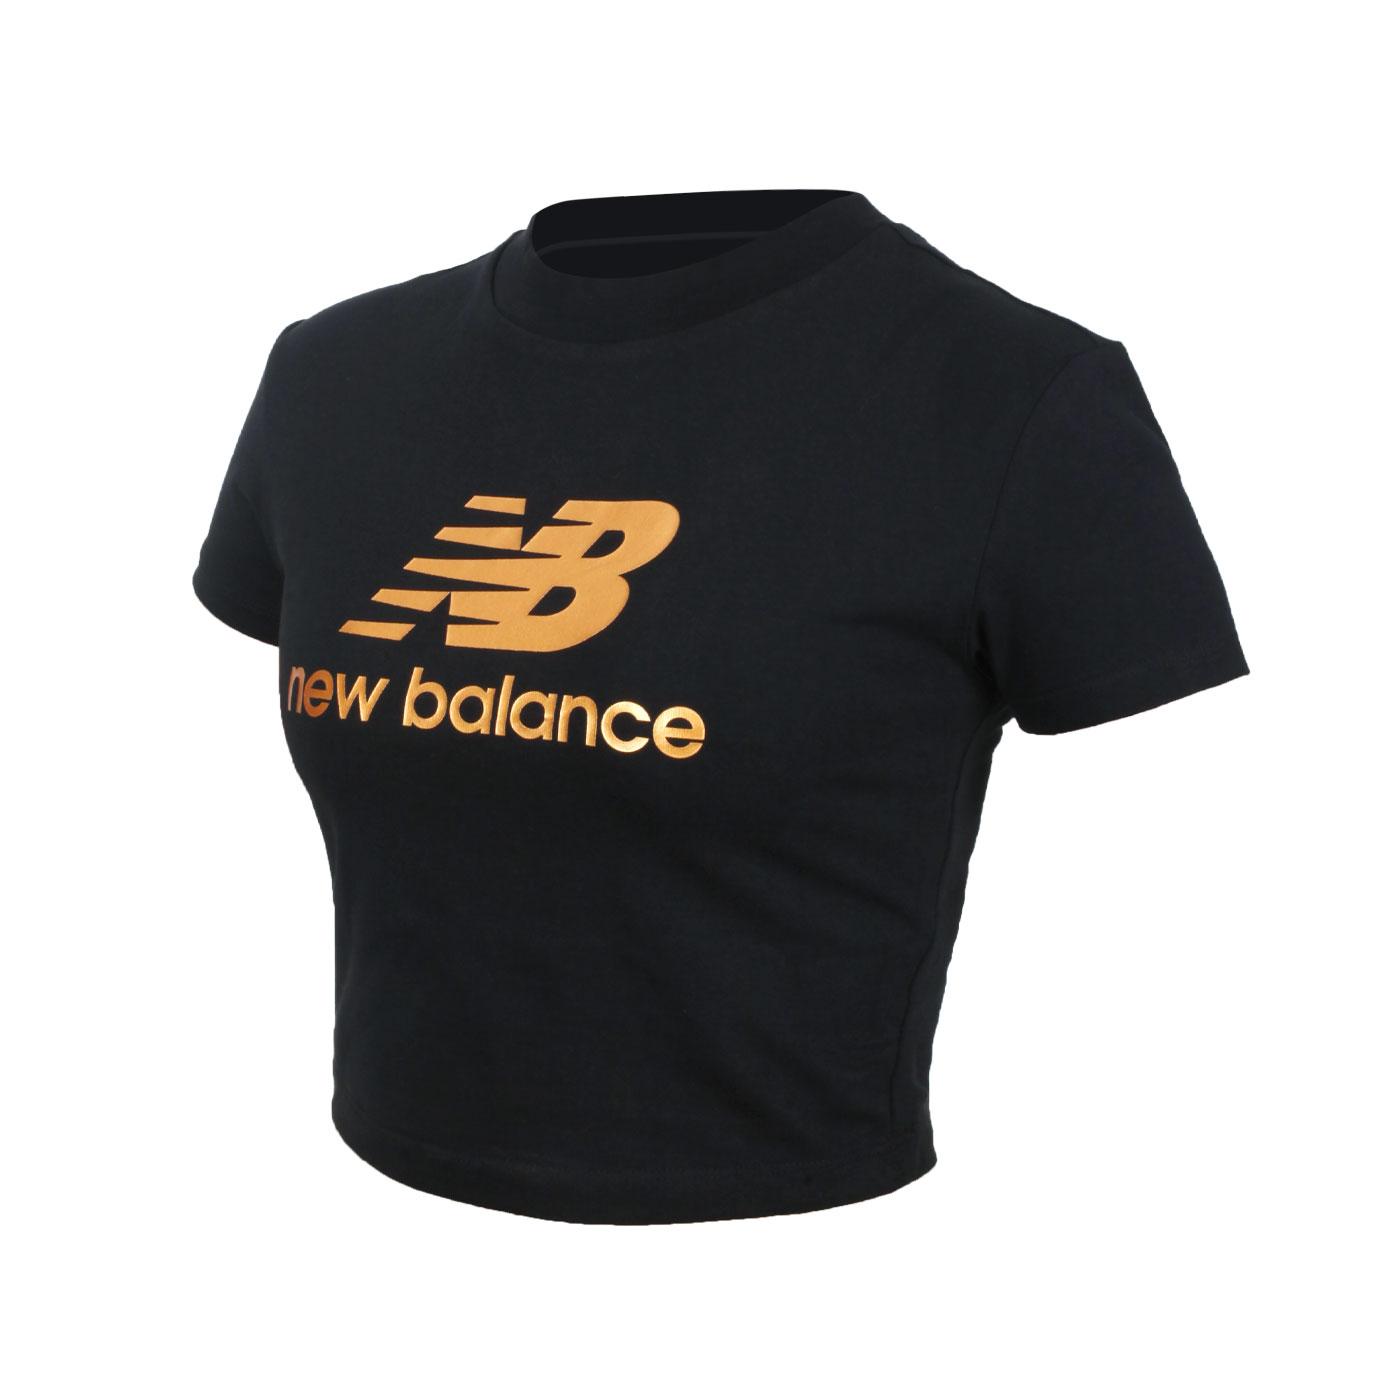 NEW BALANCE 女款短版短袖T恤 WT13503BK